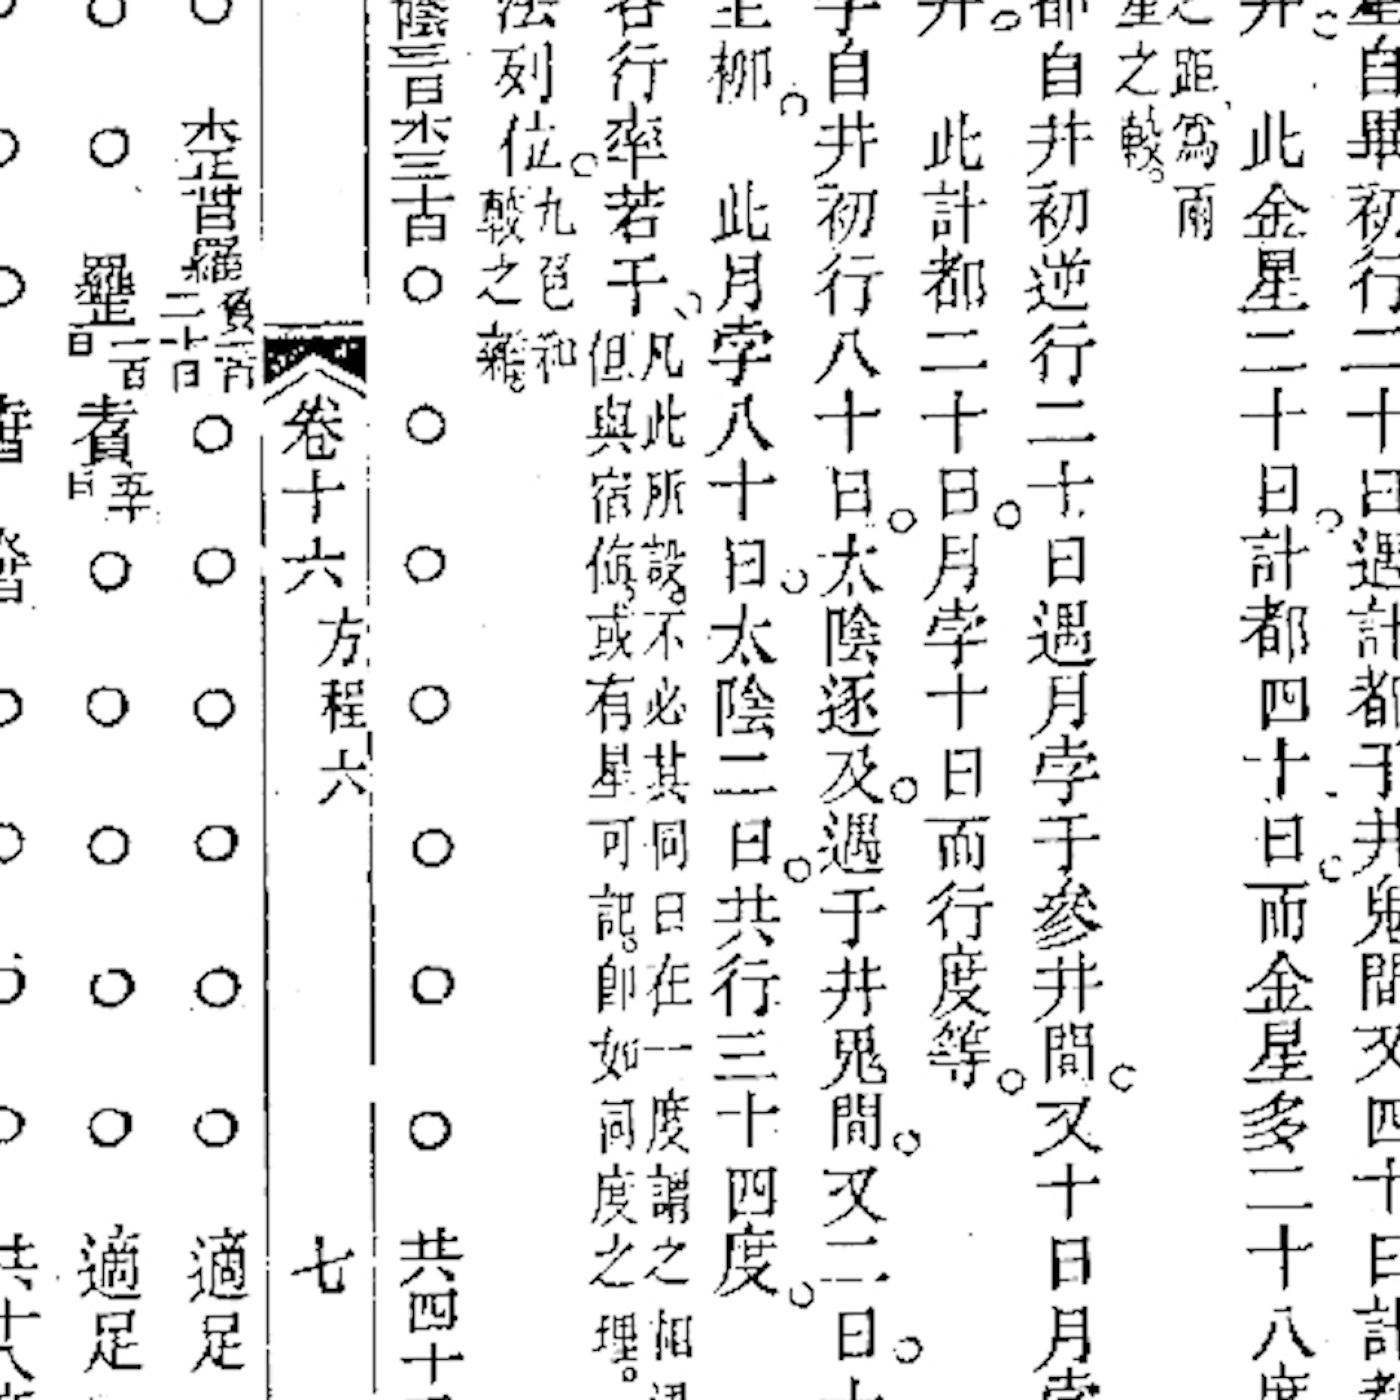 duck+czn+chinese+algebra.jpg?format=1500